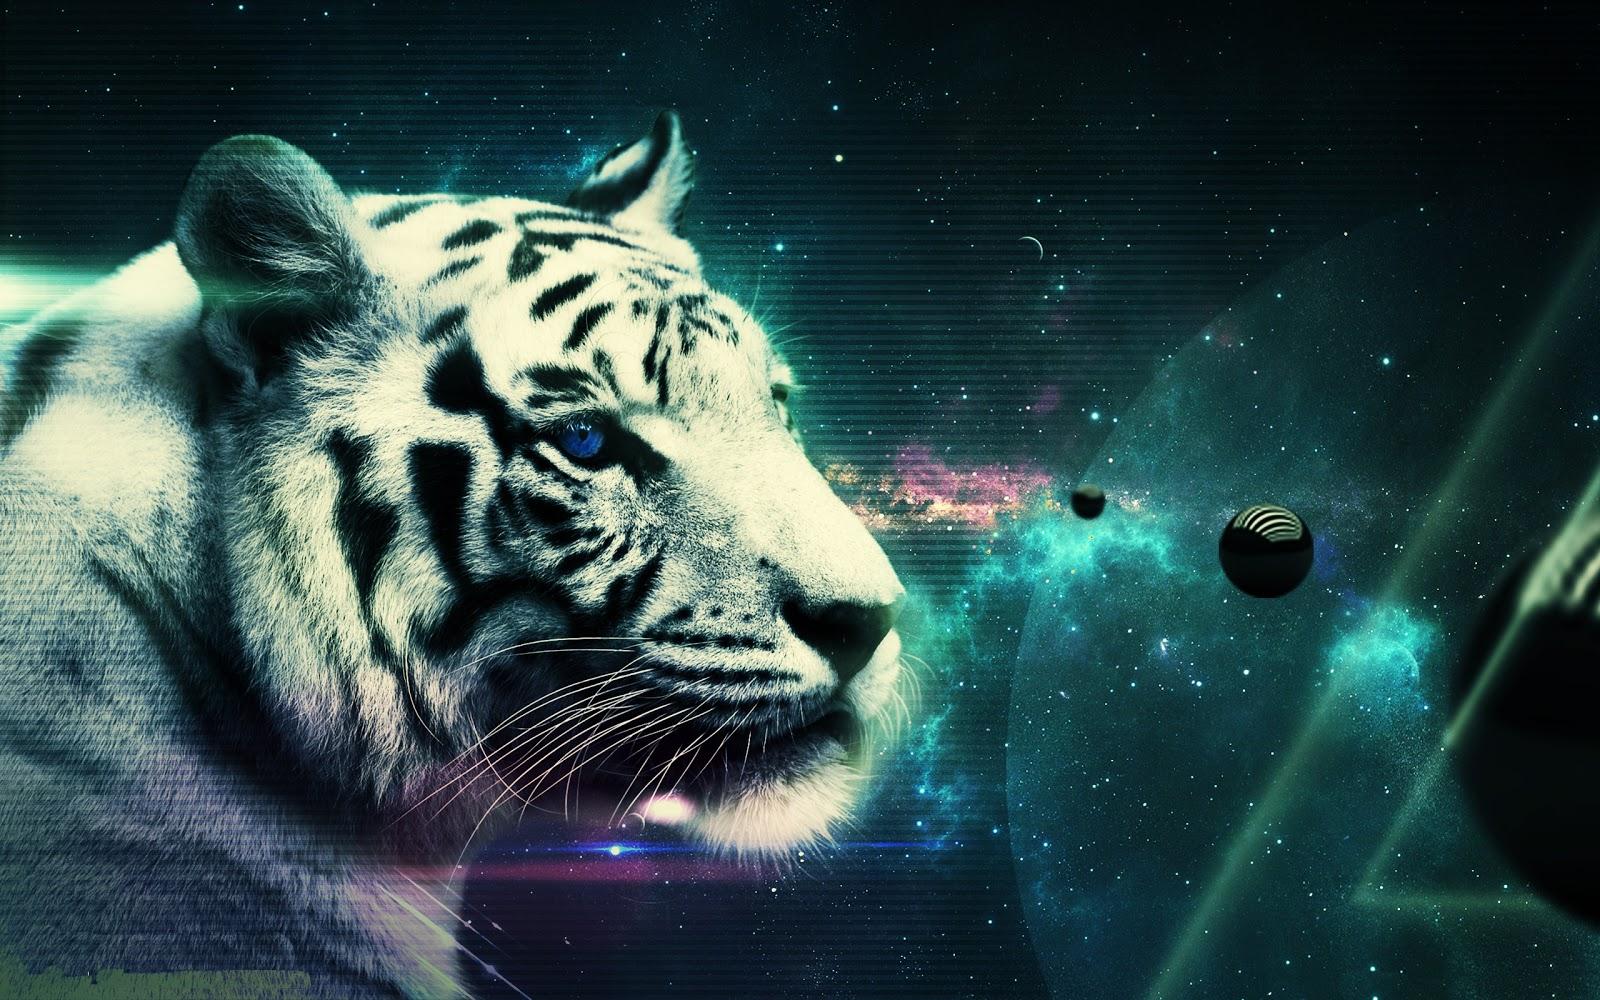 white tigerbeautiful tigerhd tiger imagessleeping tiger 1600x1000